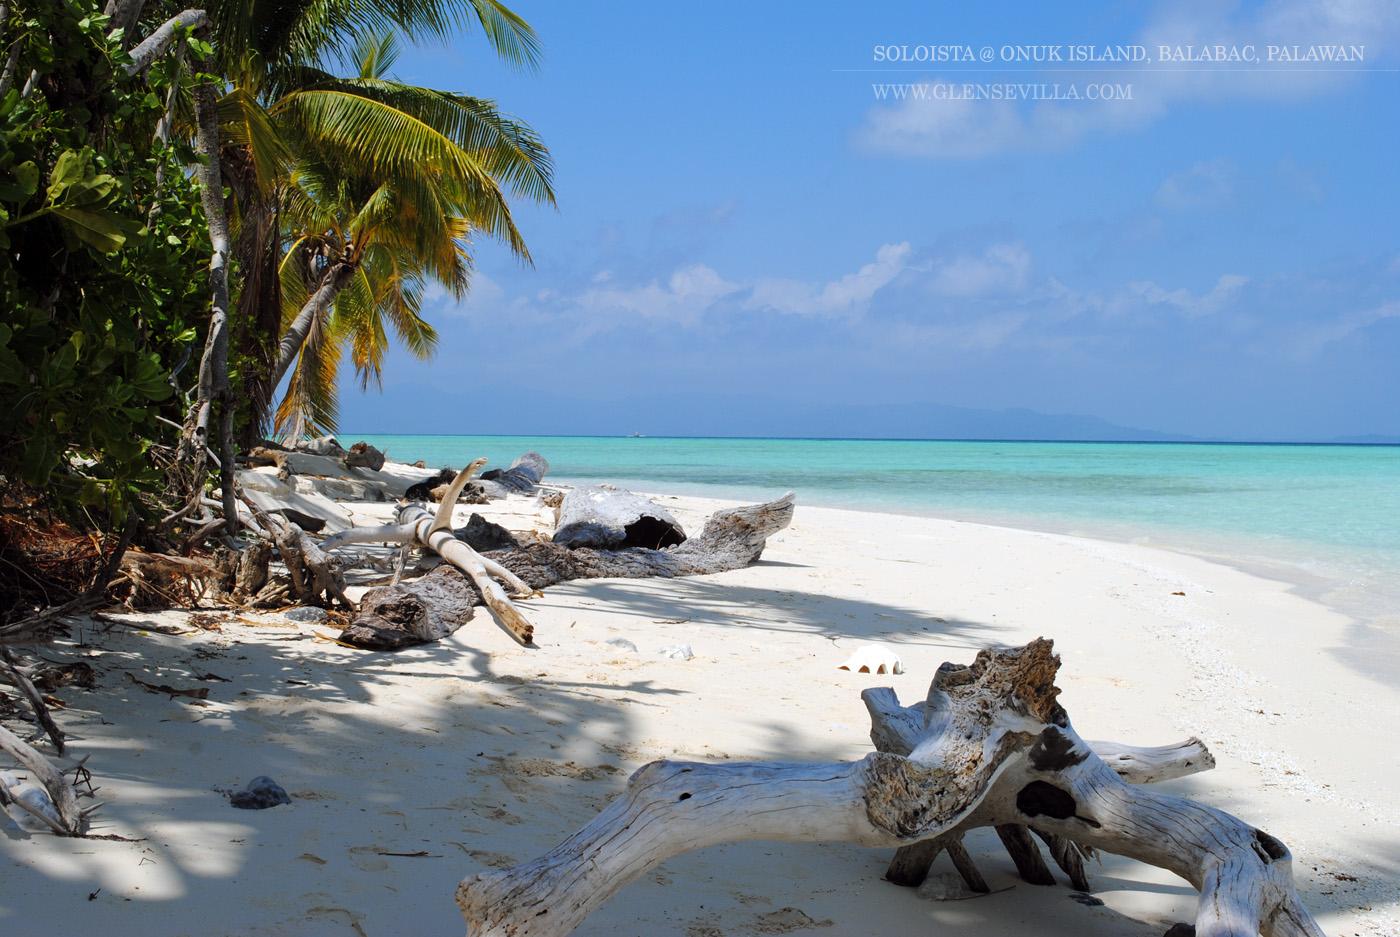 Onok Onuk Island Balabac; Palawan; Soloista